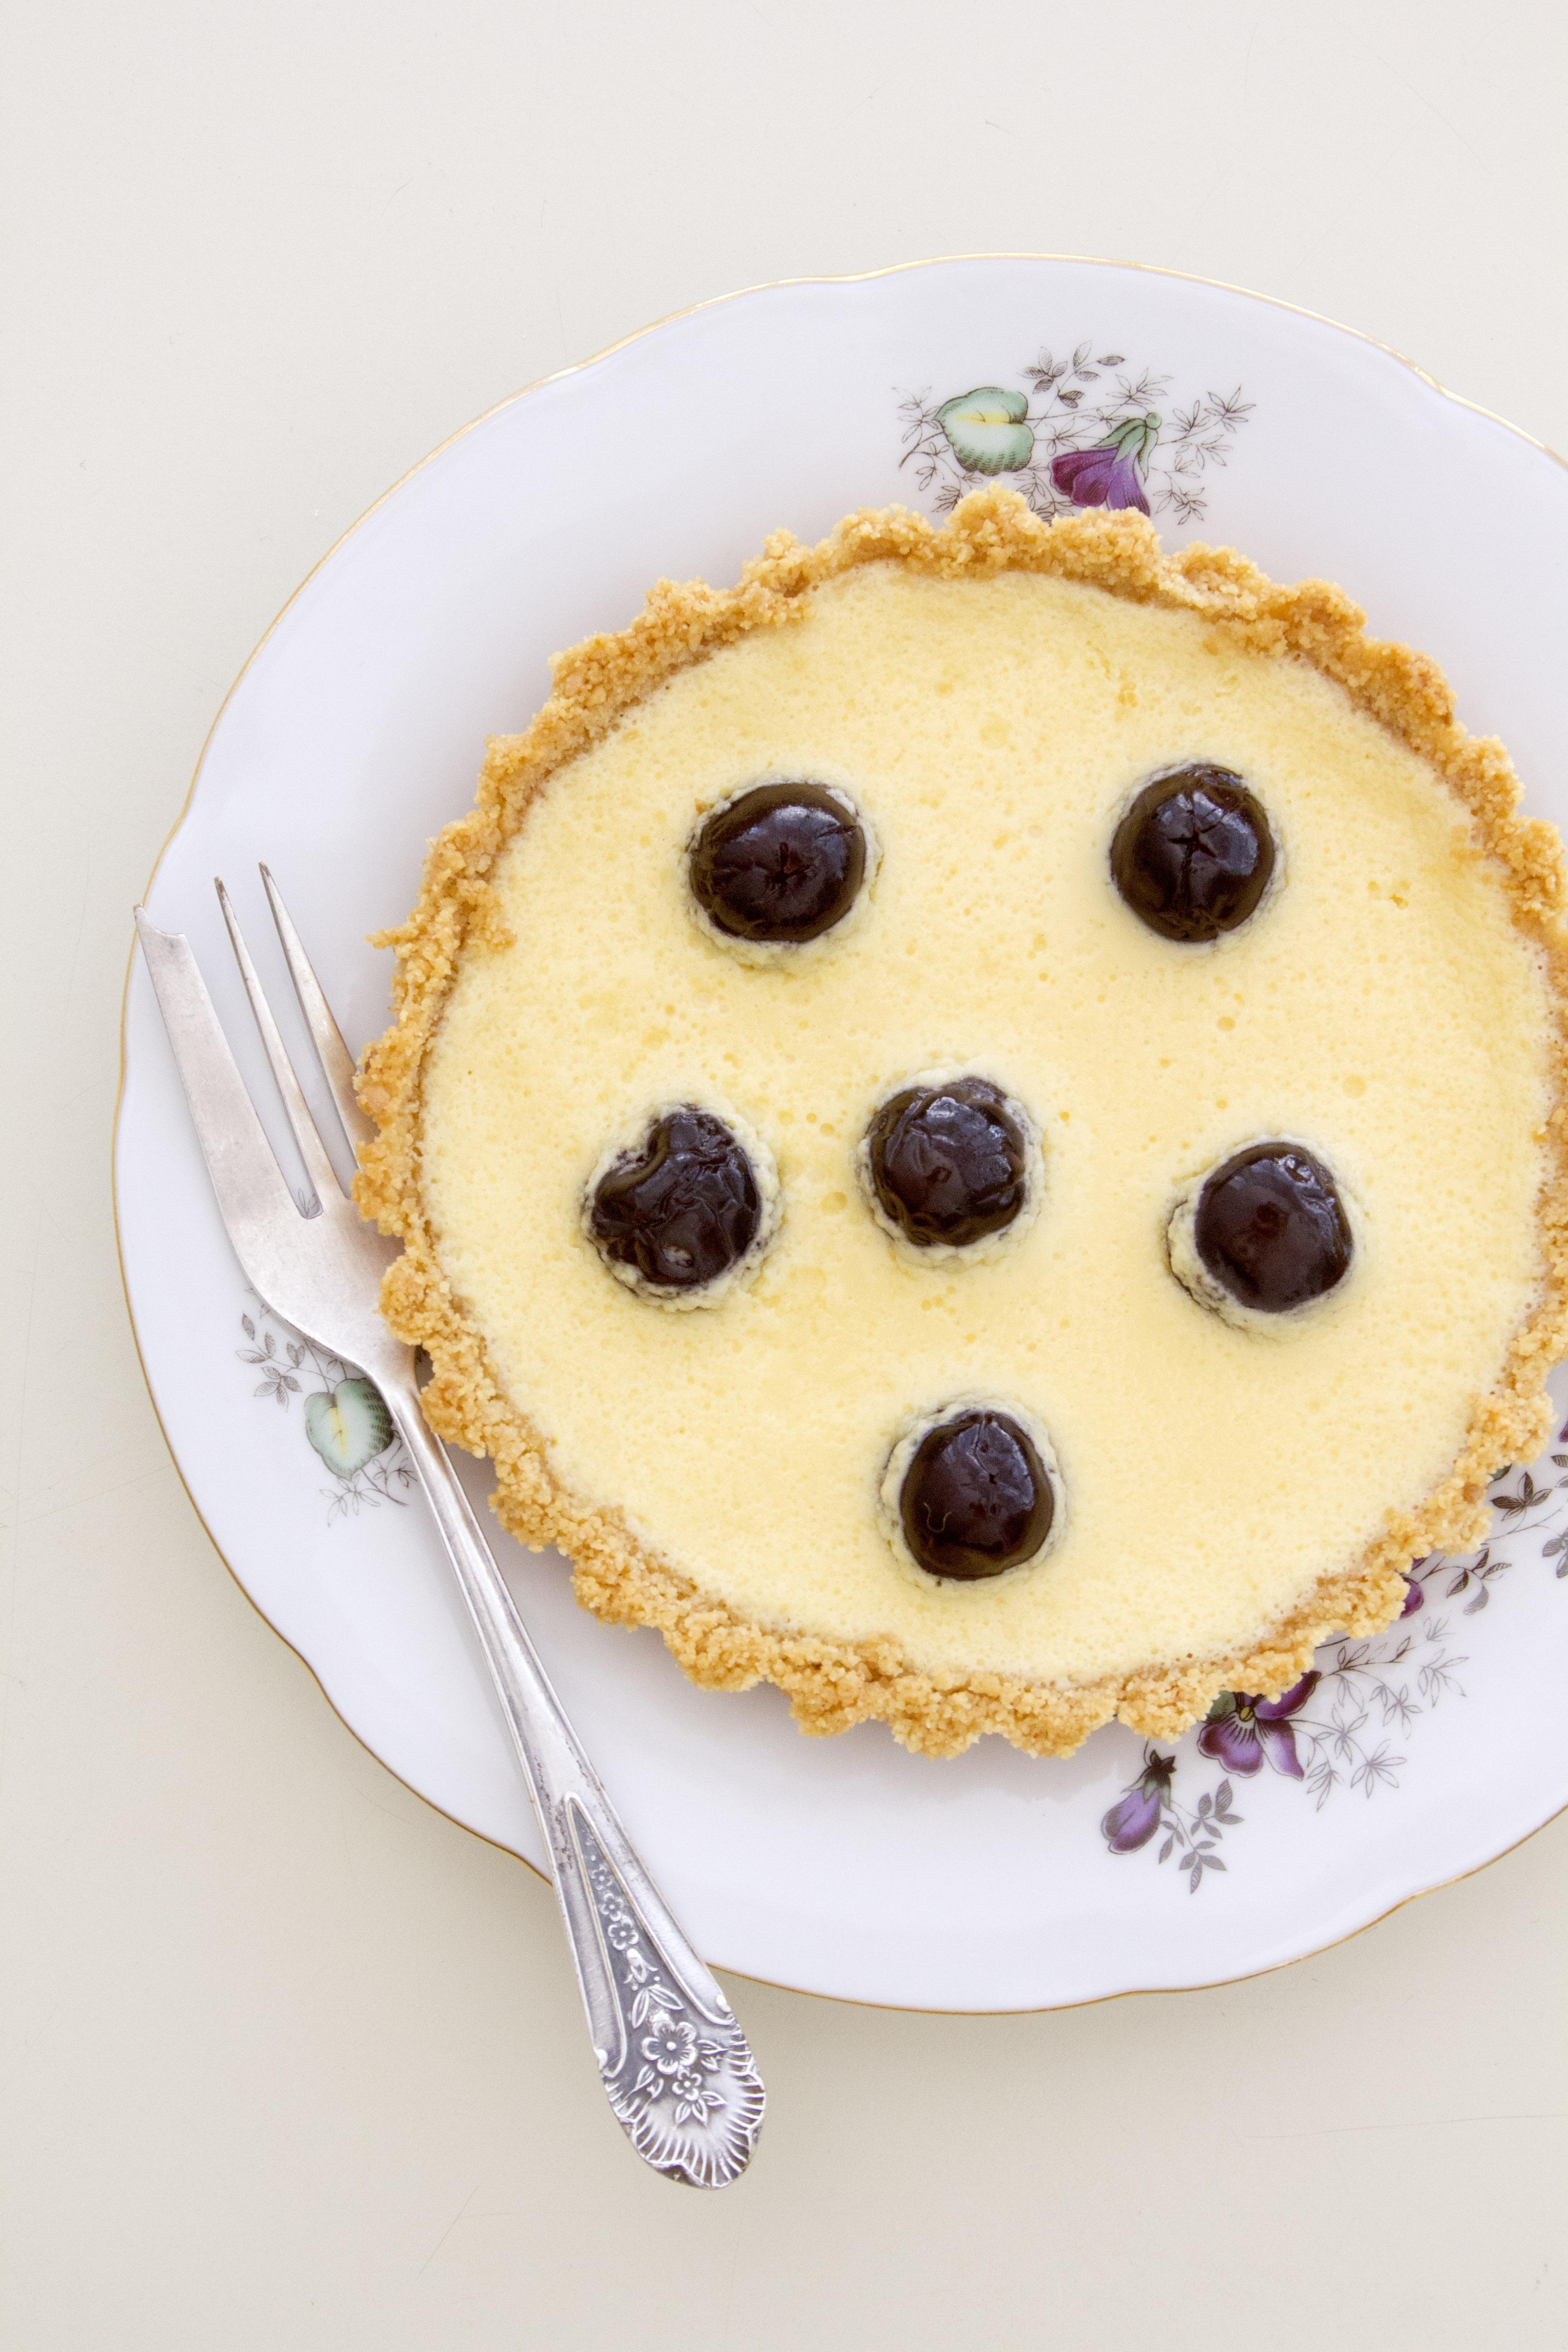 Key Lime Pie with Amrena Cherries